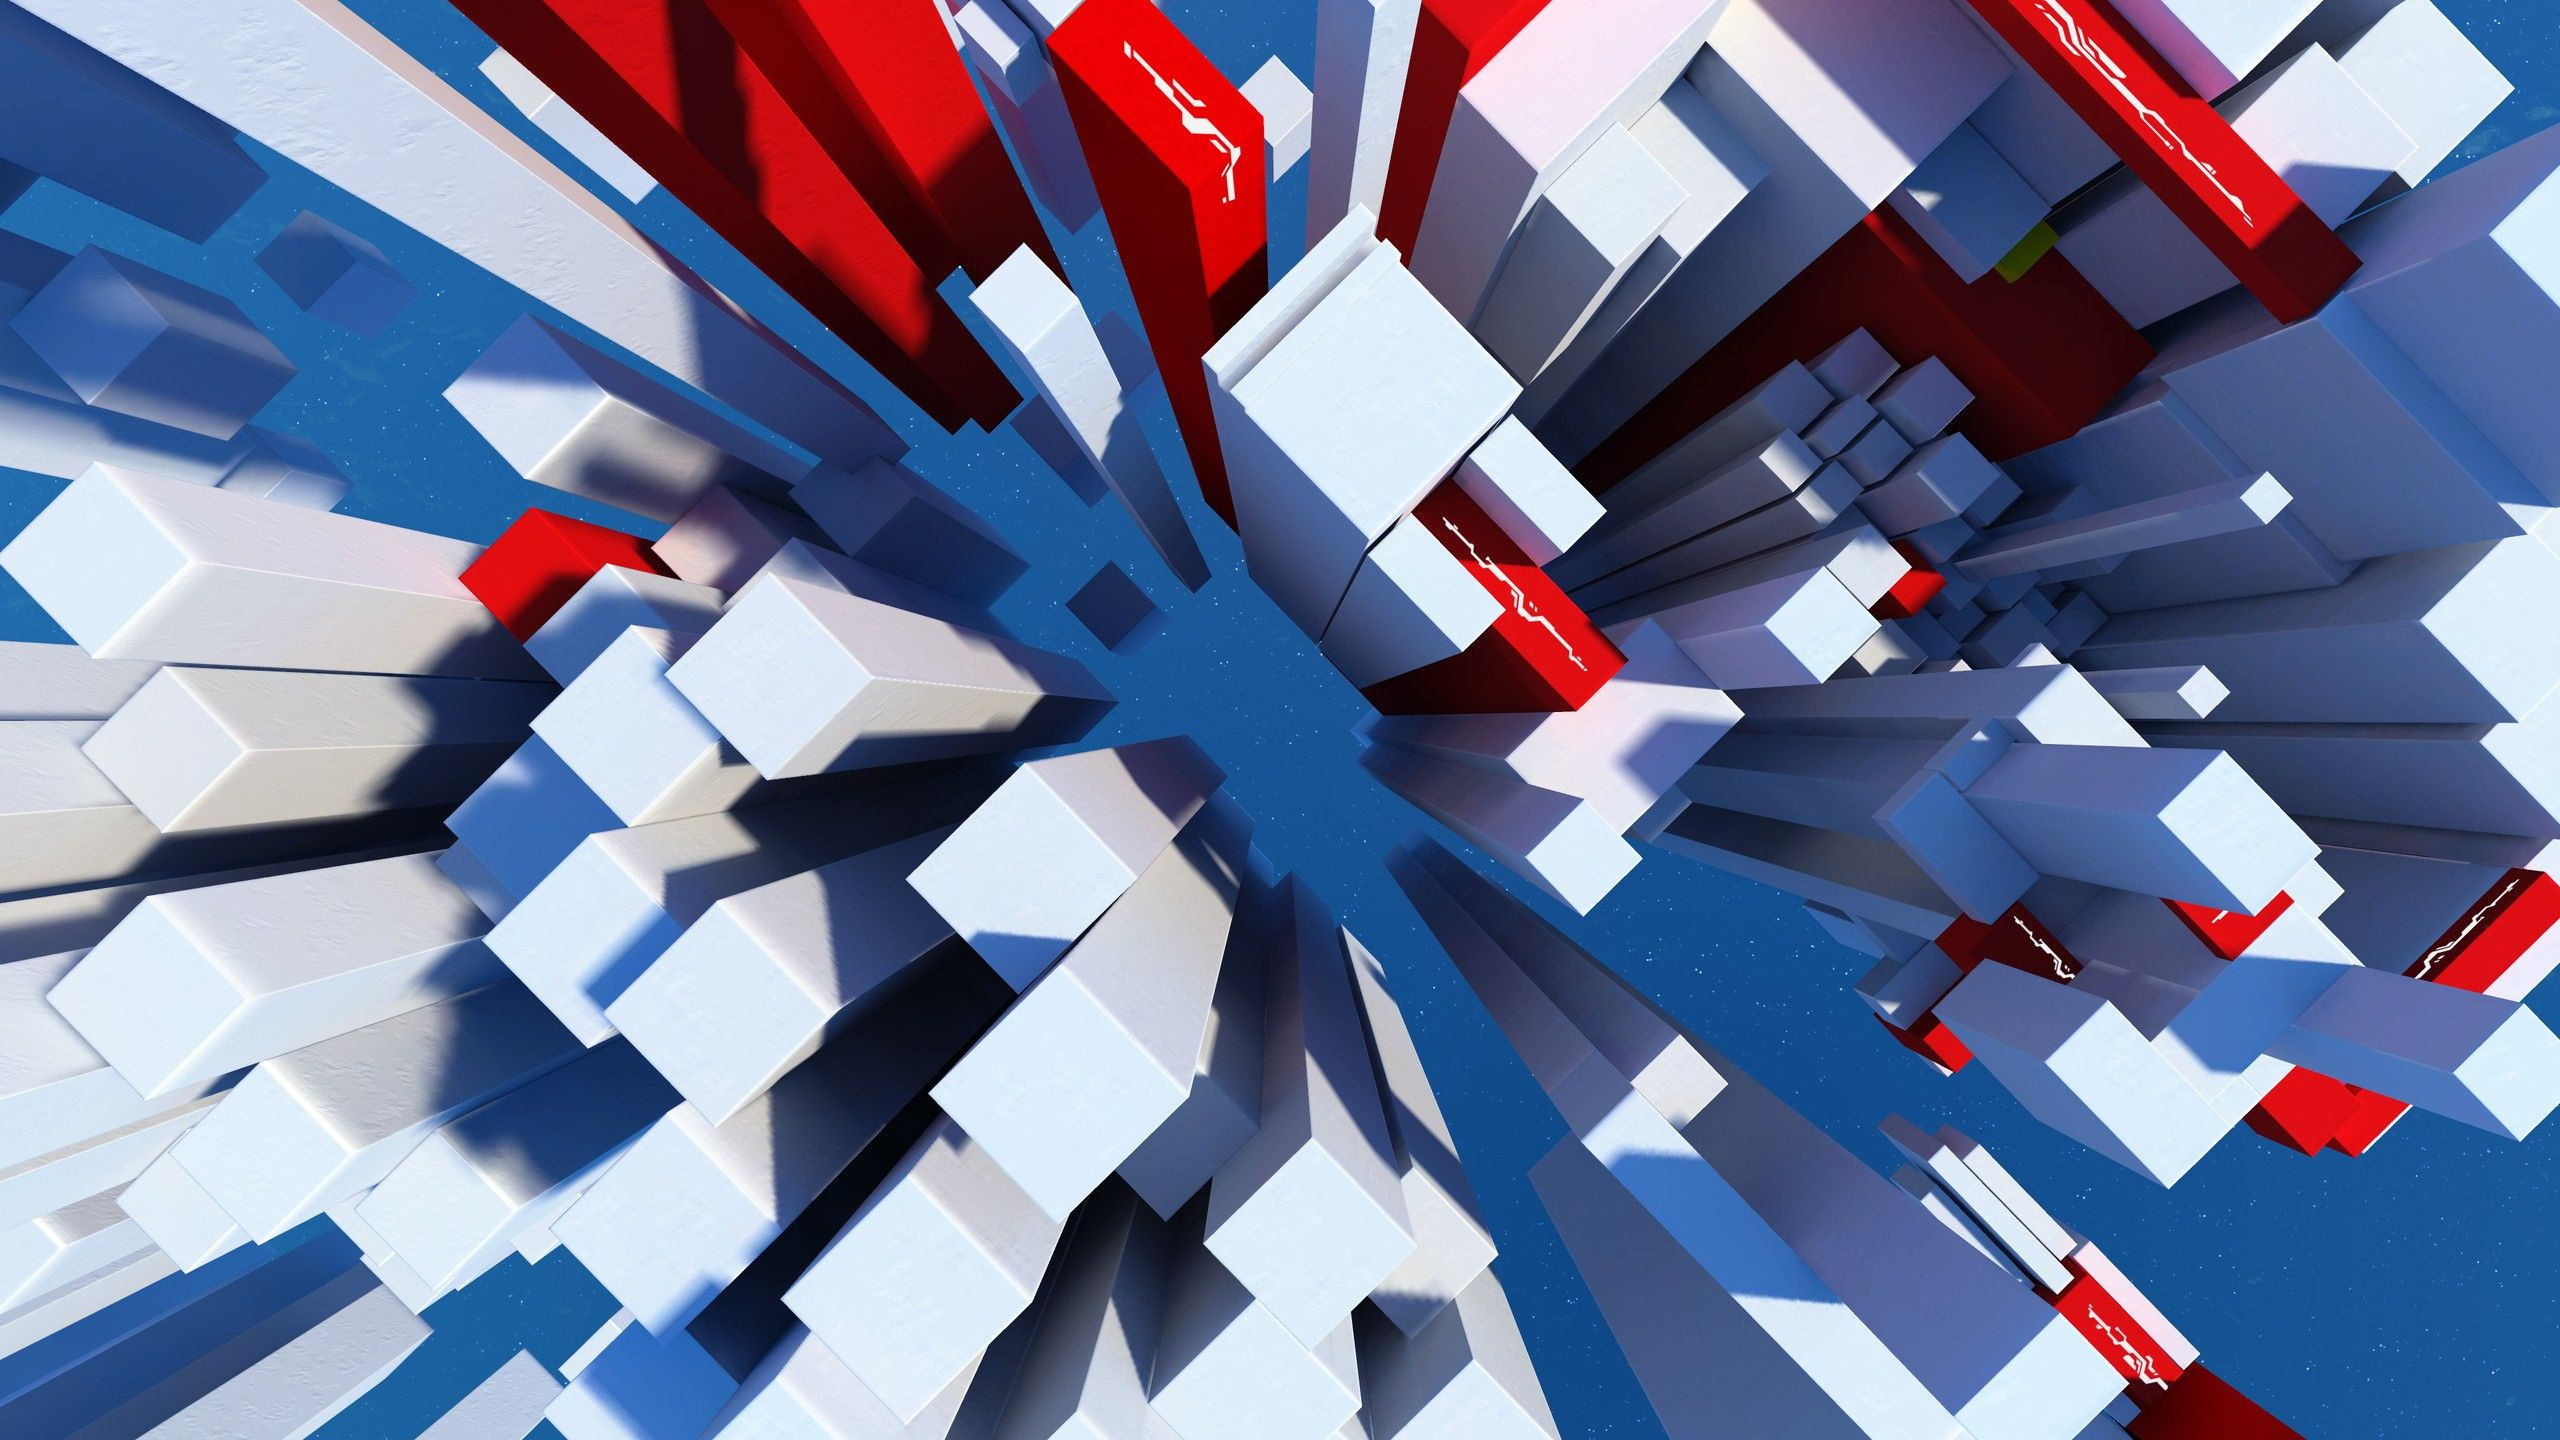 Mirrors Edge Abstract Video Games Wallpaper 2860059 Wallbase